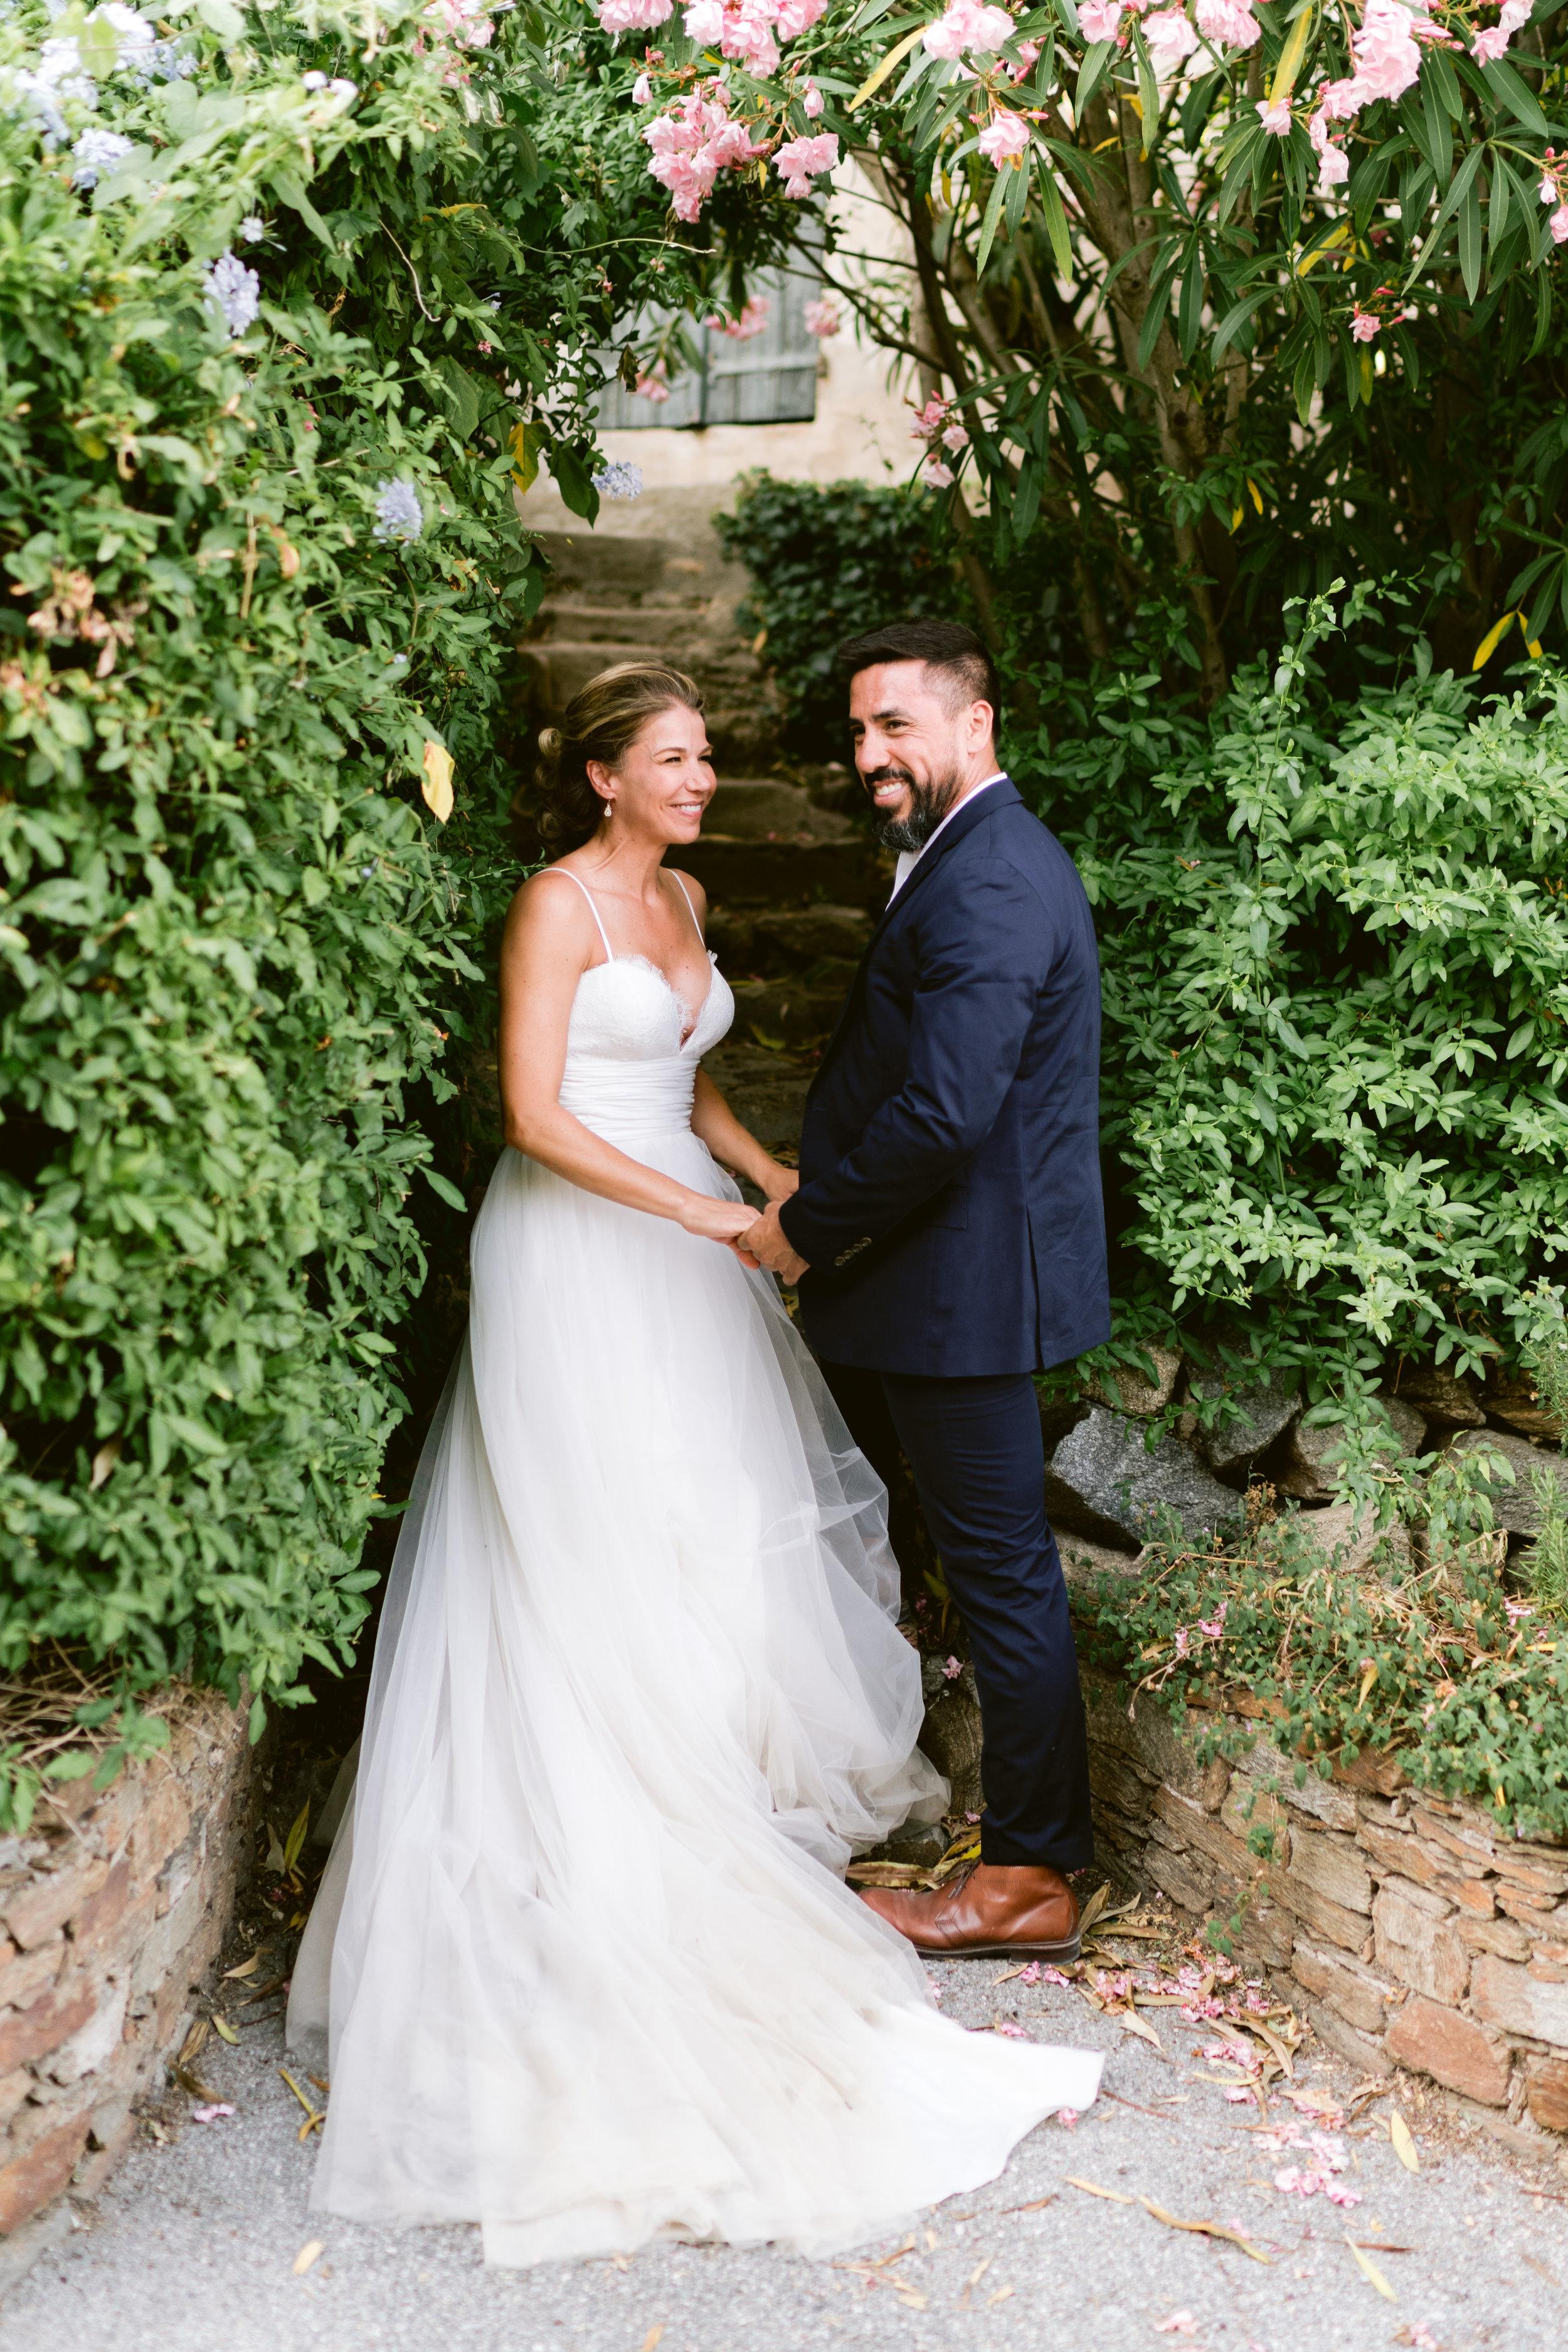 english photographer in france, wedding photographer saint tropez, romantic wedding photography france, chateau wedding france, cote d'azur wedding photographer, ramatuelle wedding (7).jpg